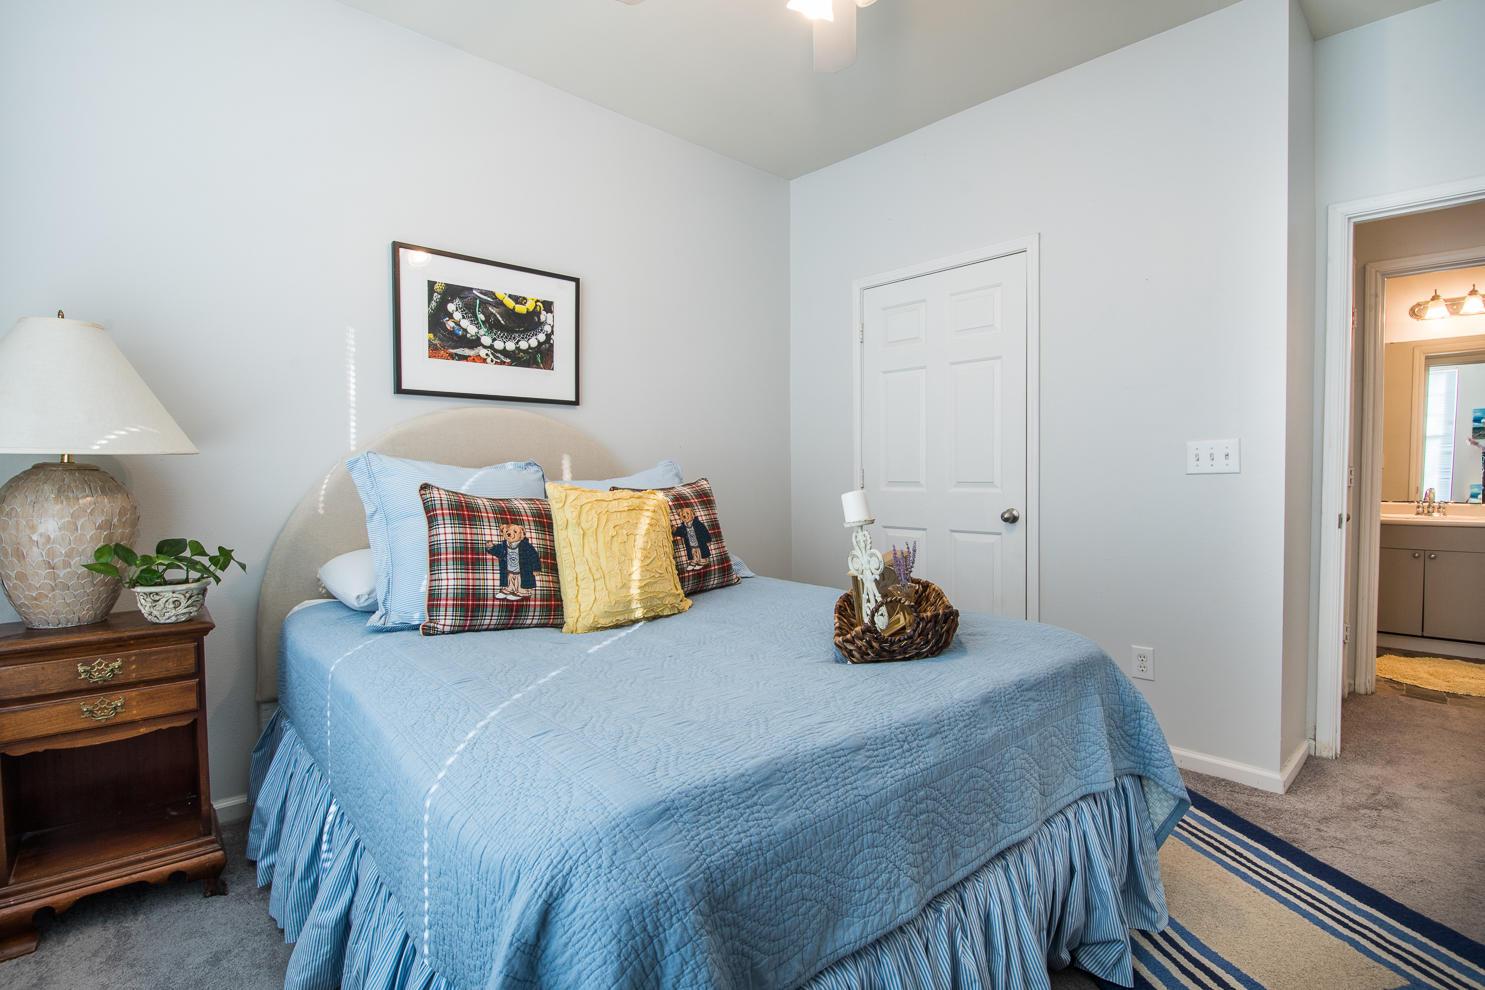 Daniel Landing Condos Homes For Sale - 130 River Landing, Charleston, SC - 19